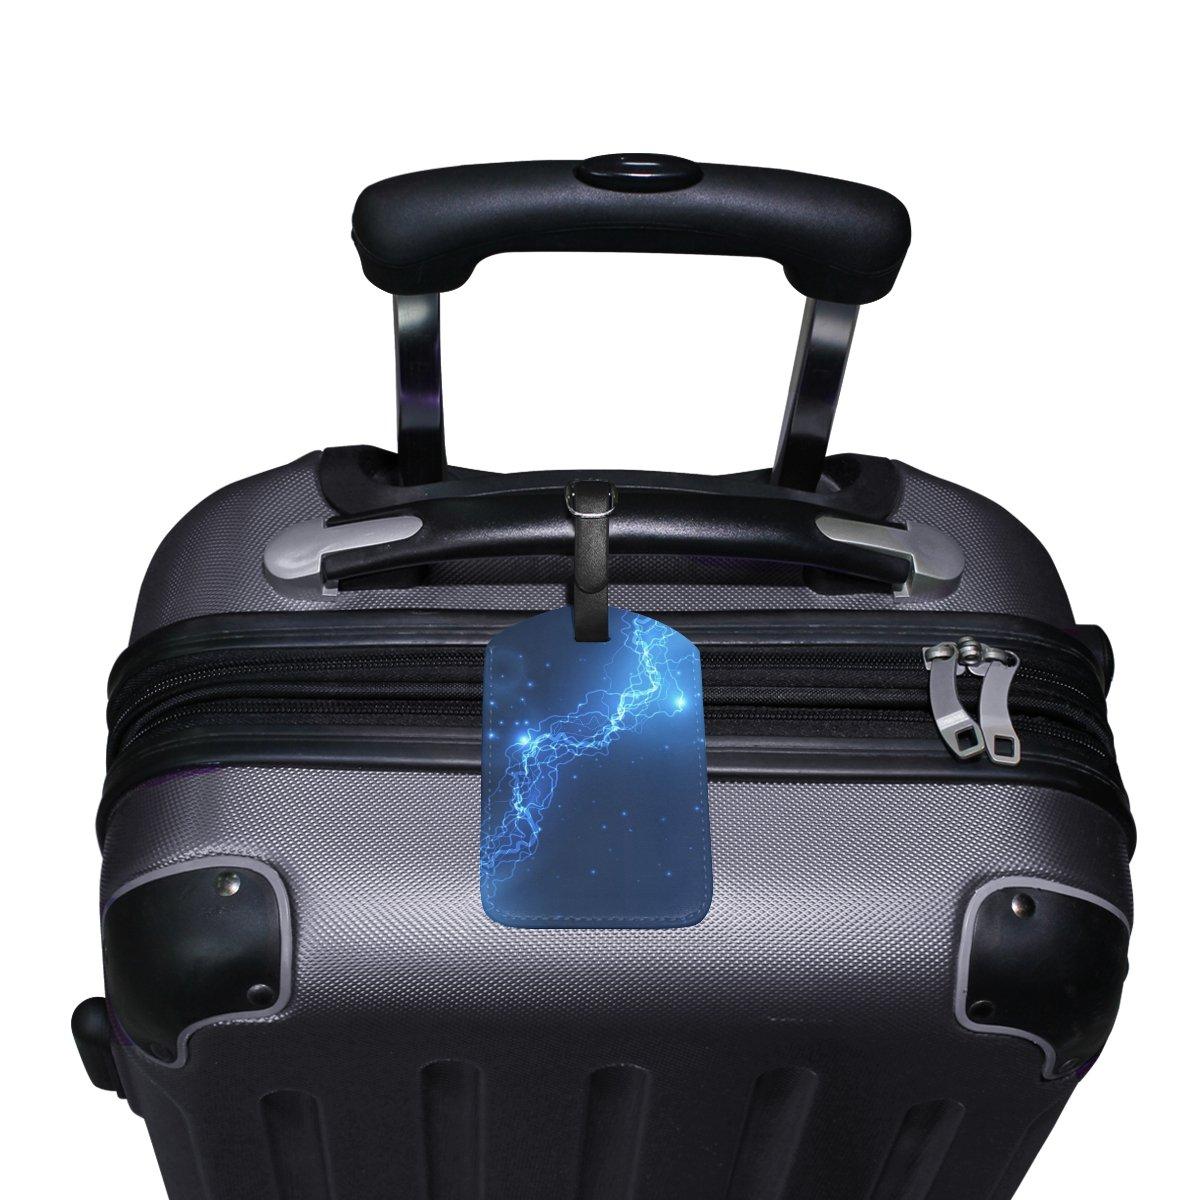 Saobao Travel Luggage Tag Magic Of Light PU Leather Baggage Suitcase Travel ID Bag Tag 1Pcs